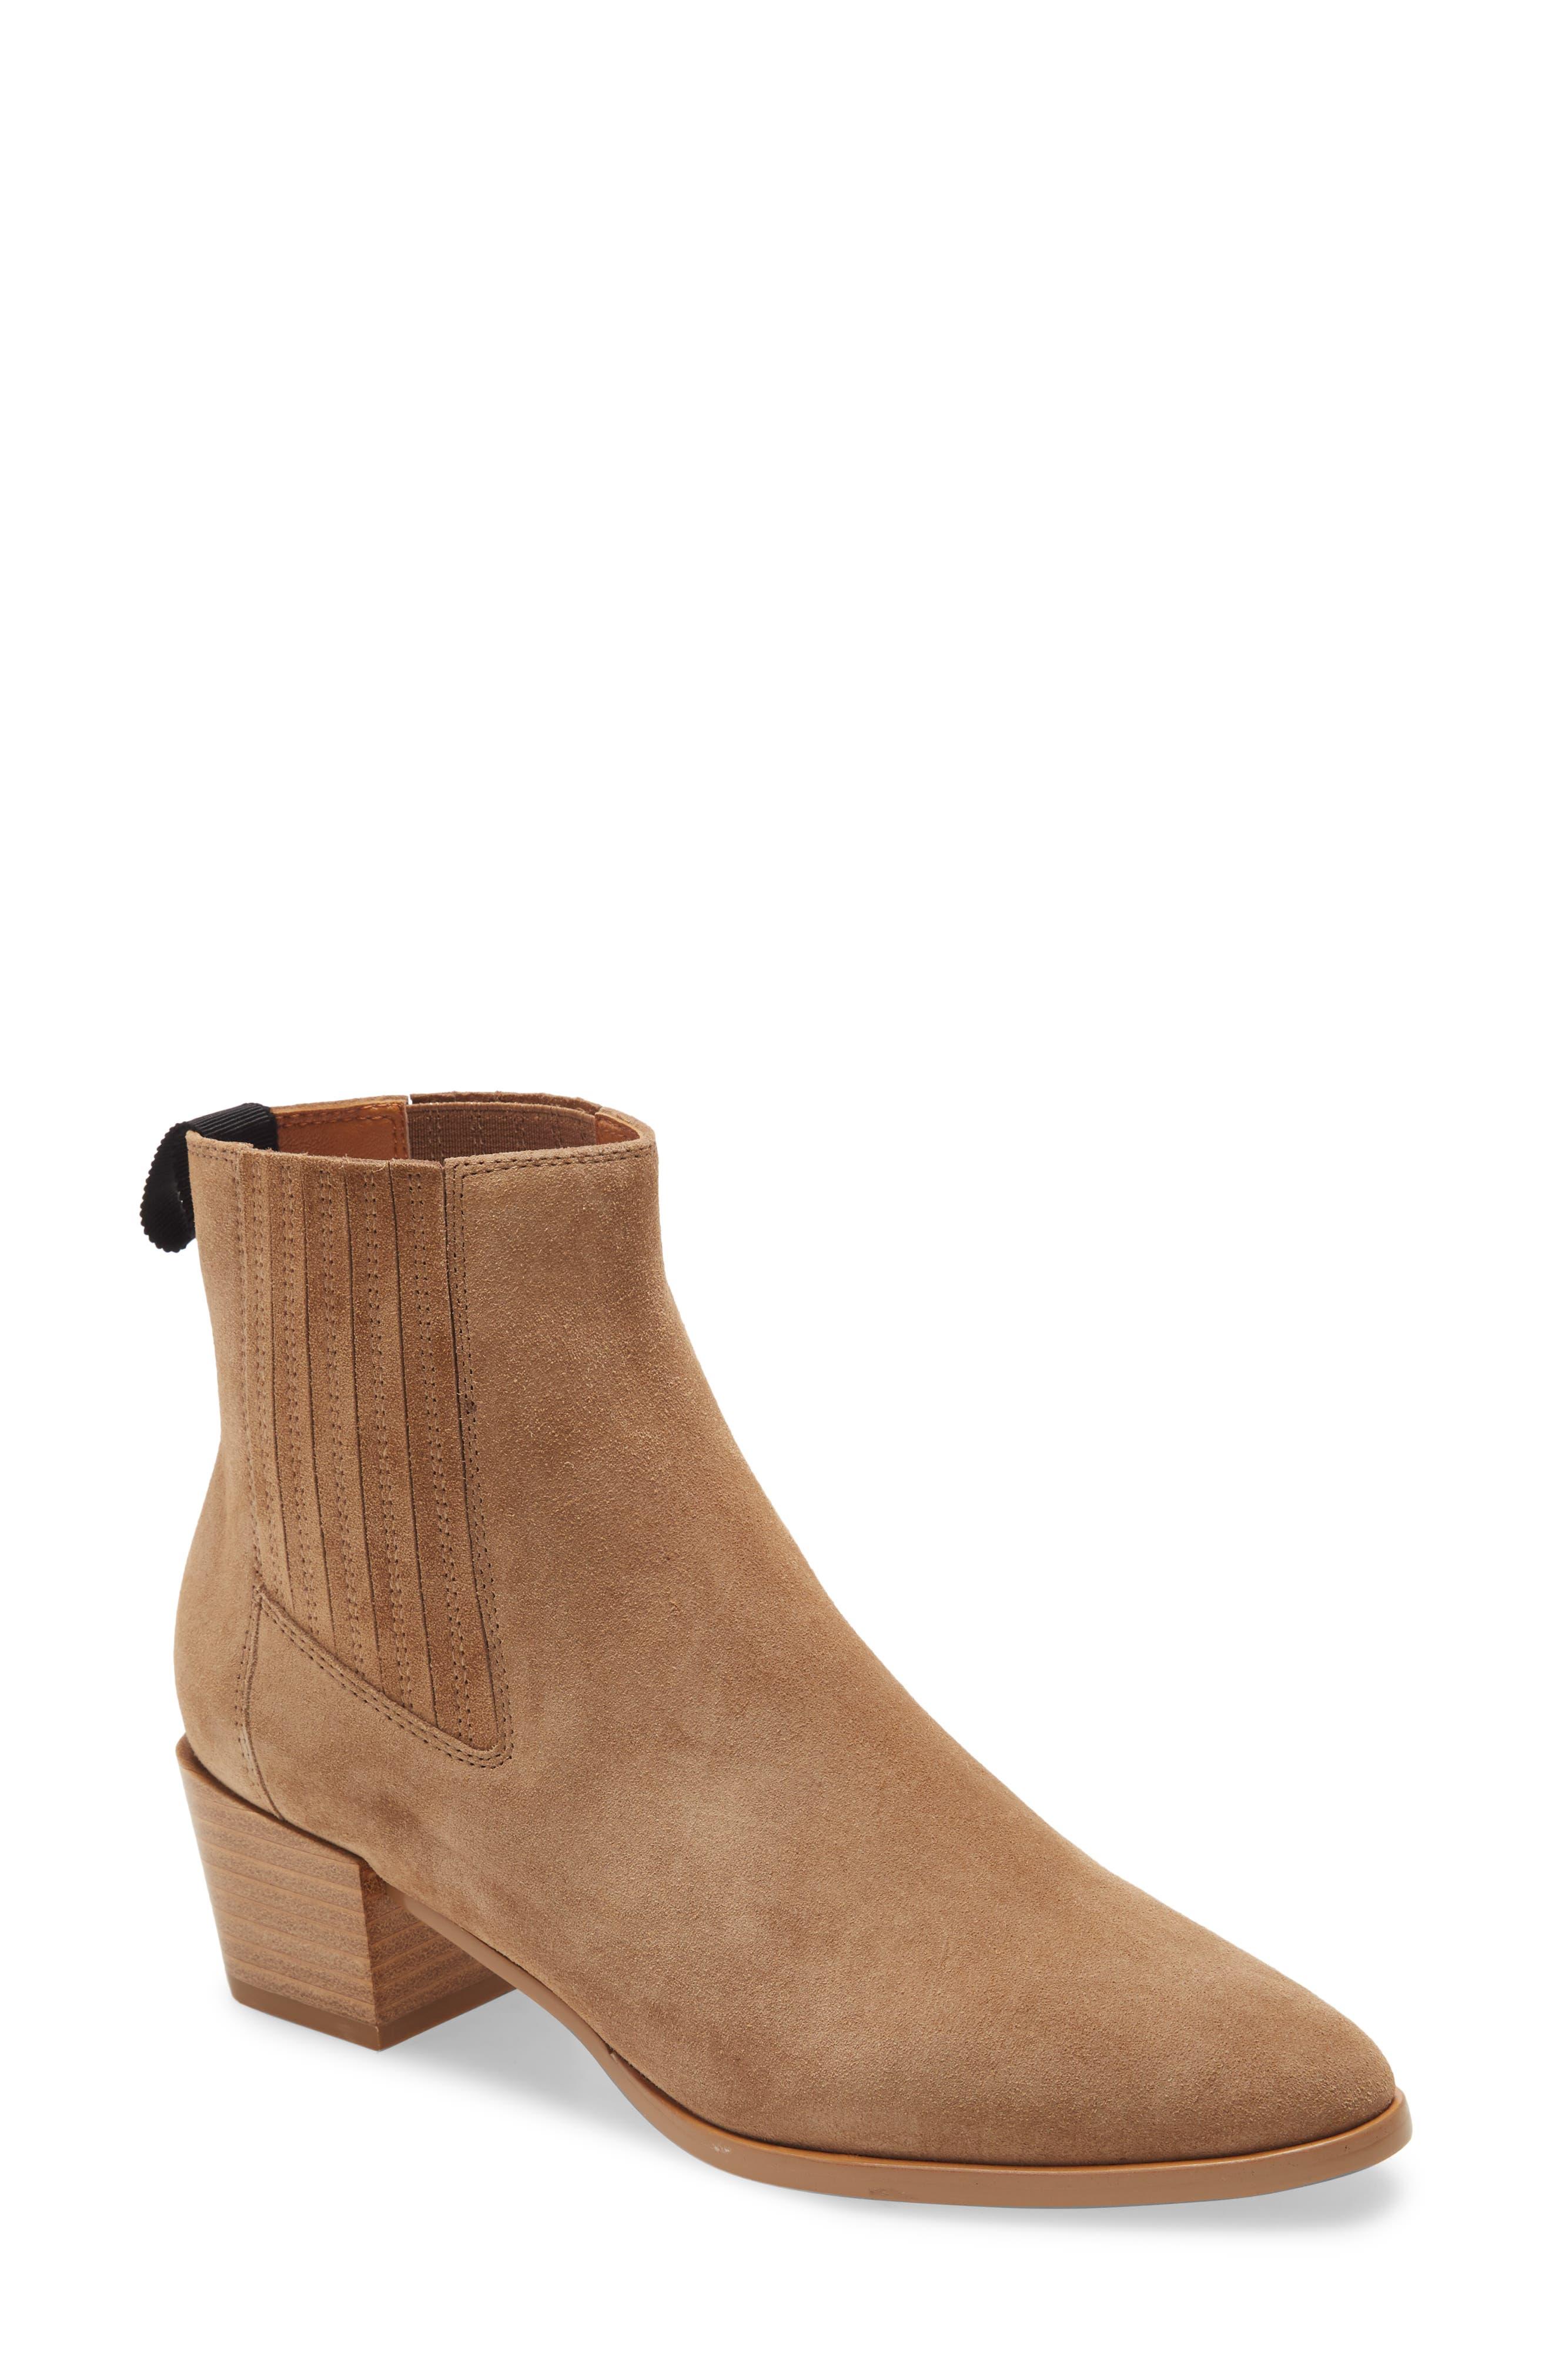 Image of Rag & Bone Rover Chelsea Boot